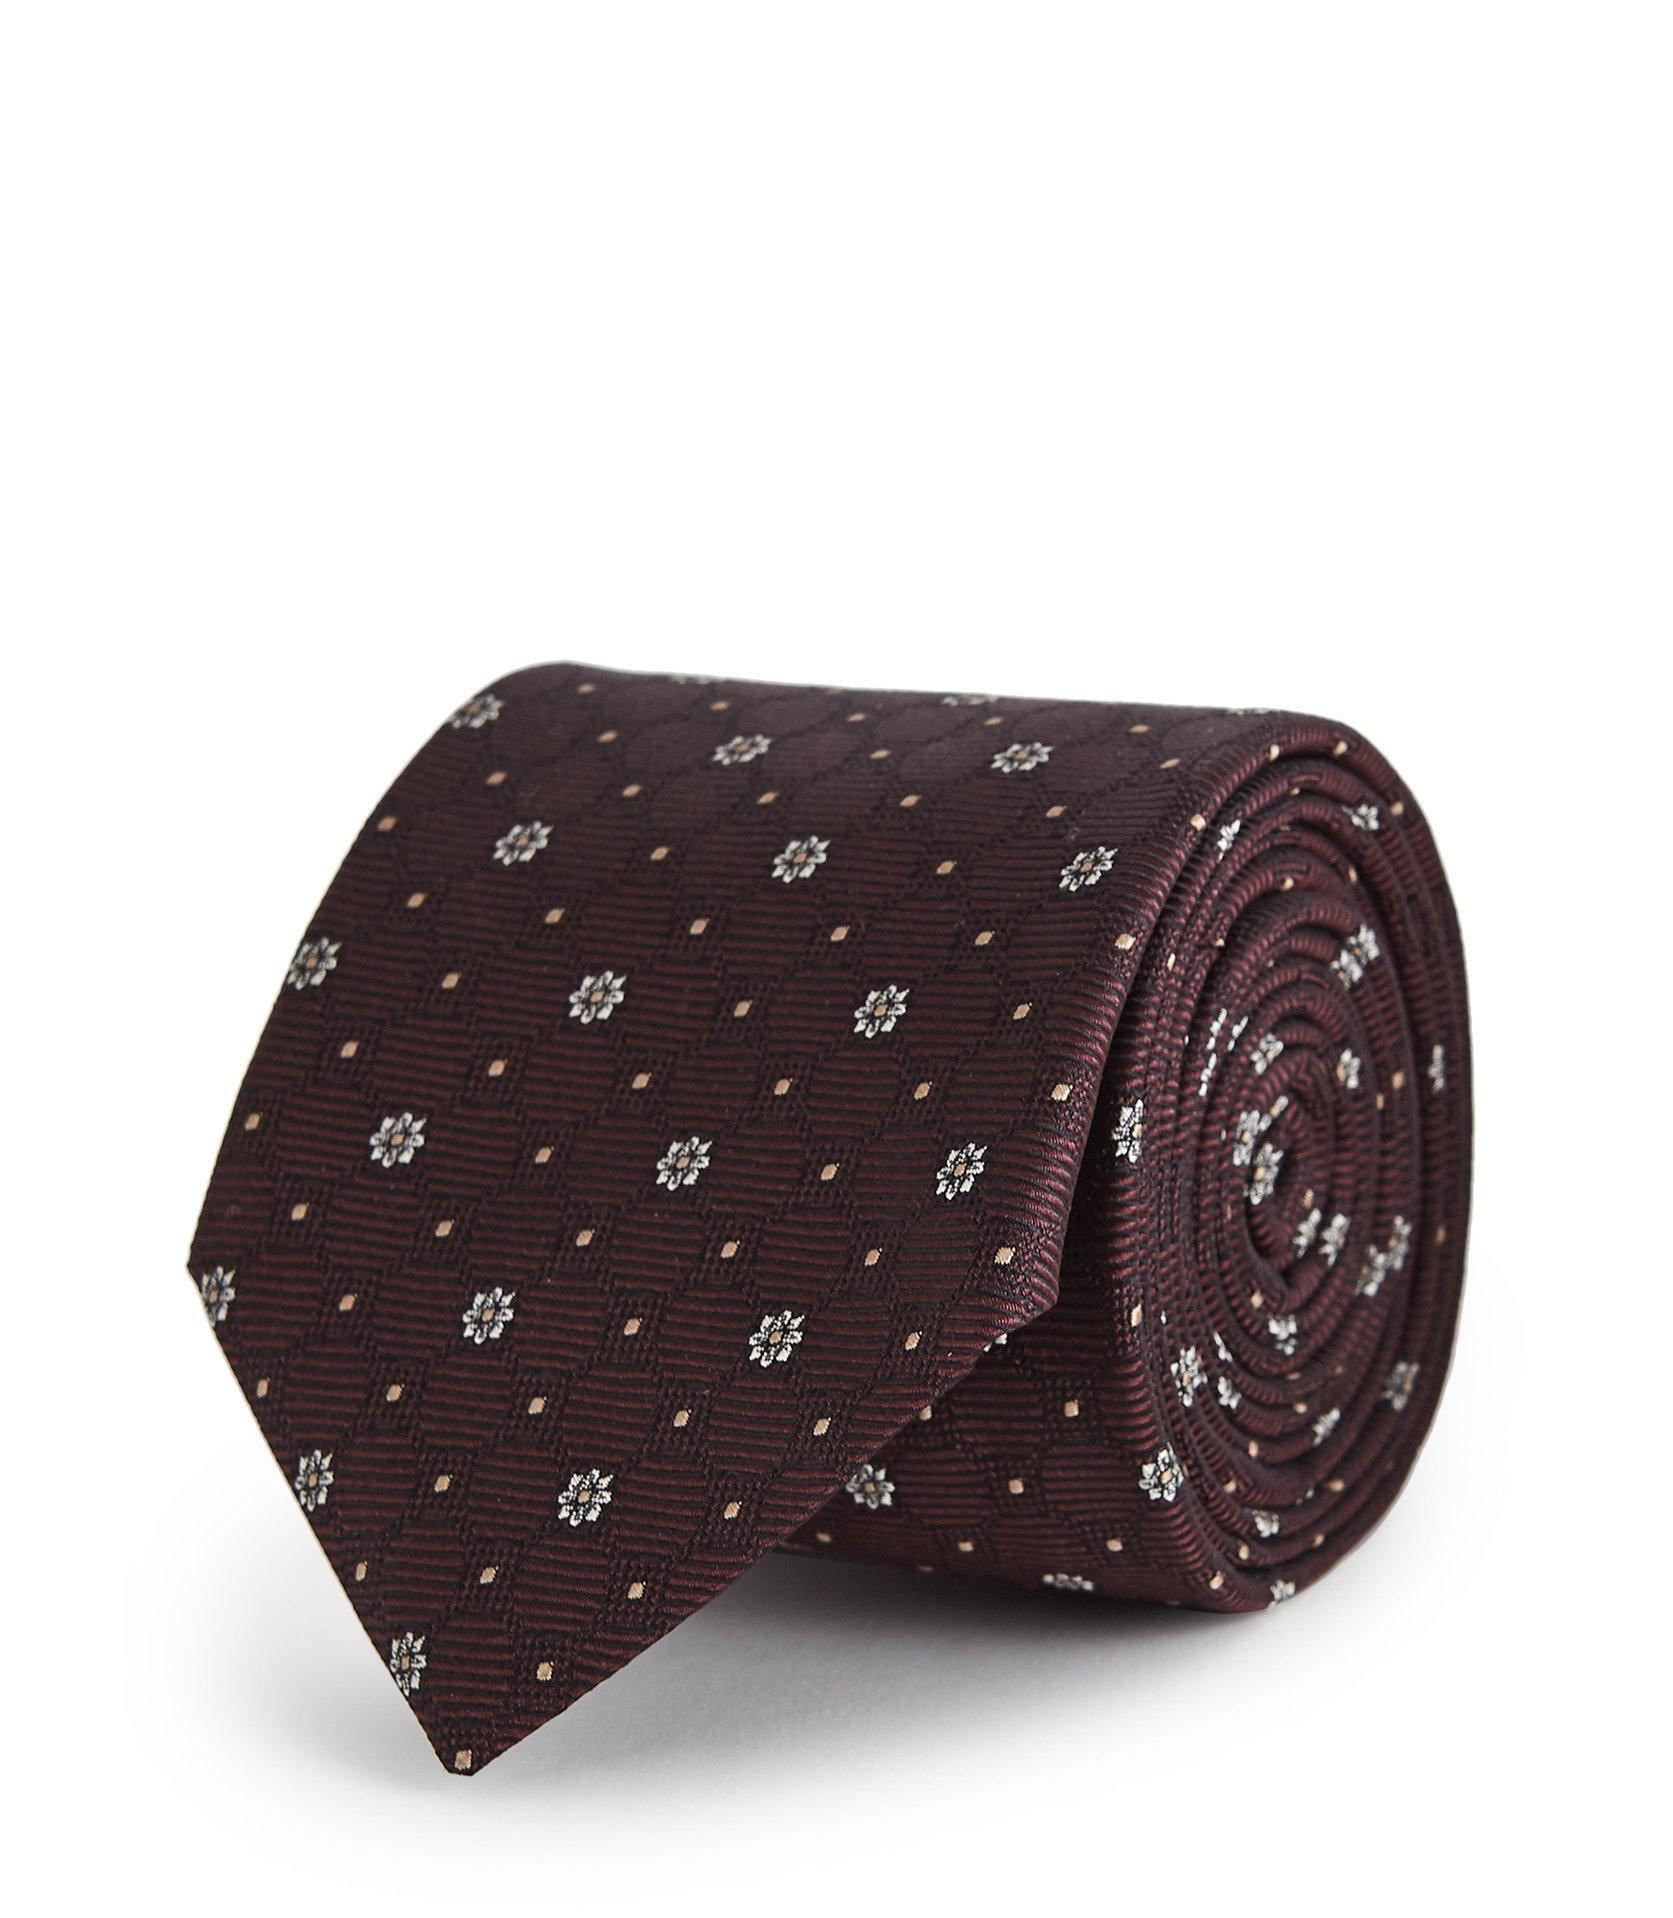 Reiss Burgundy Tie